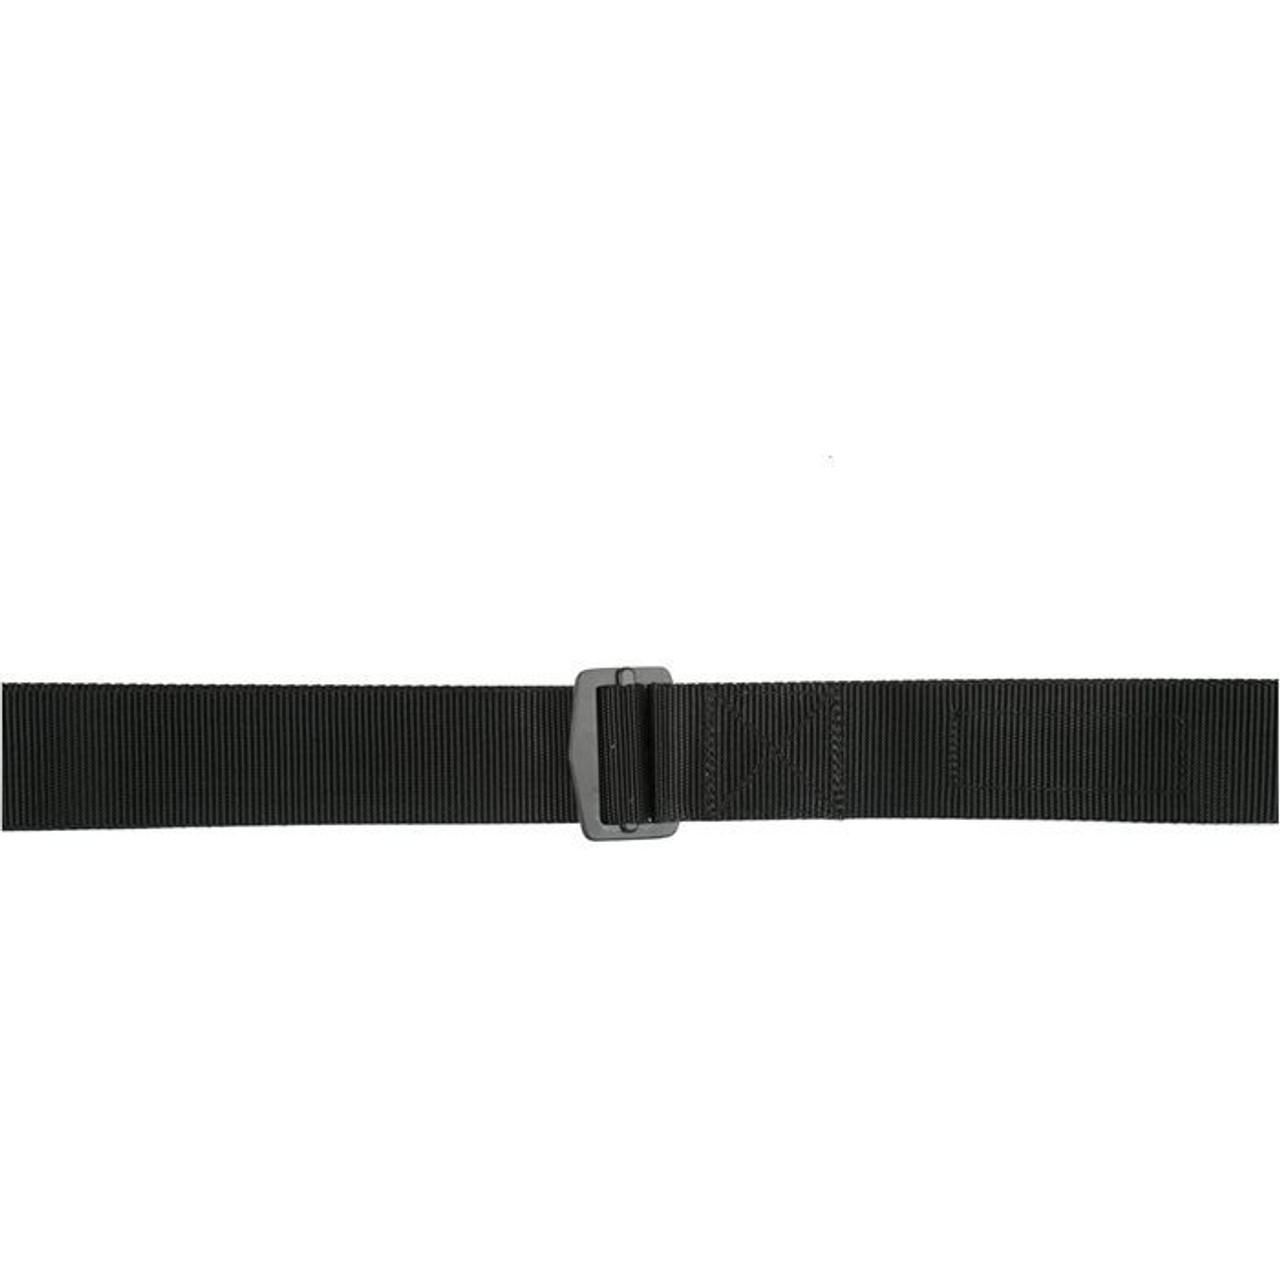 Blackhawk Universal BDU Belt - 41UB01BK